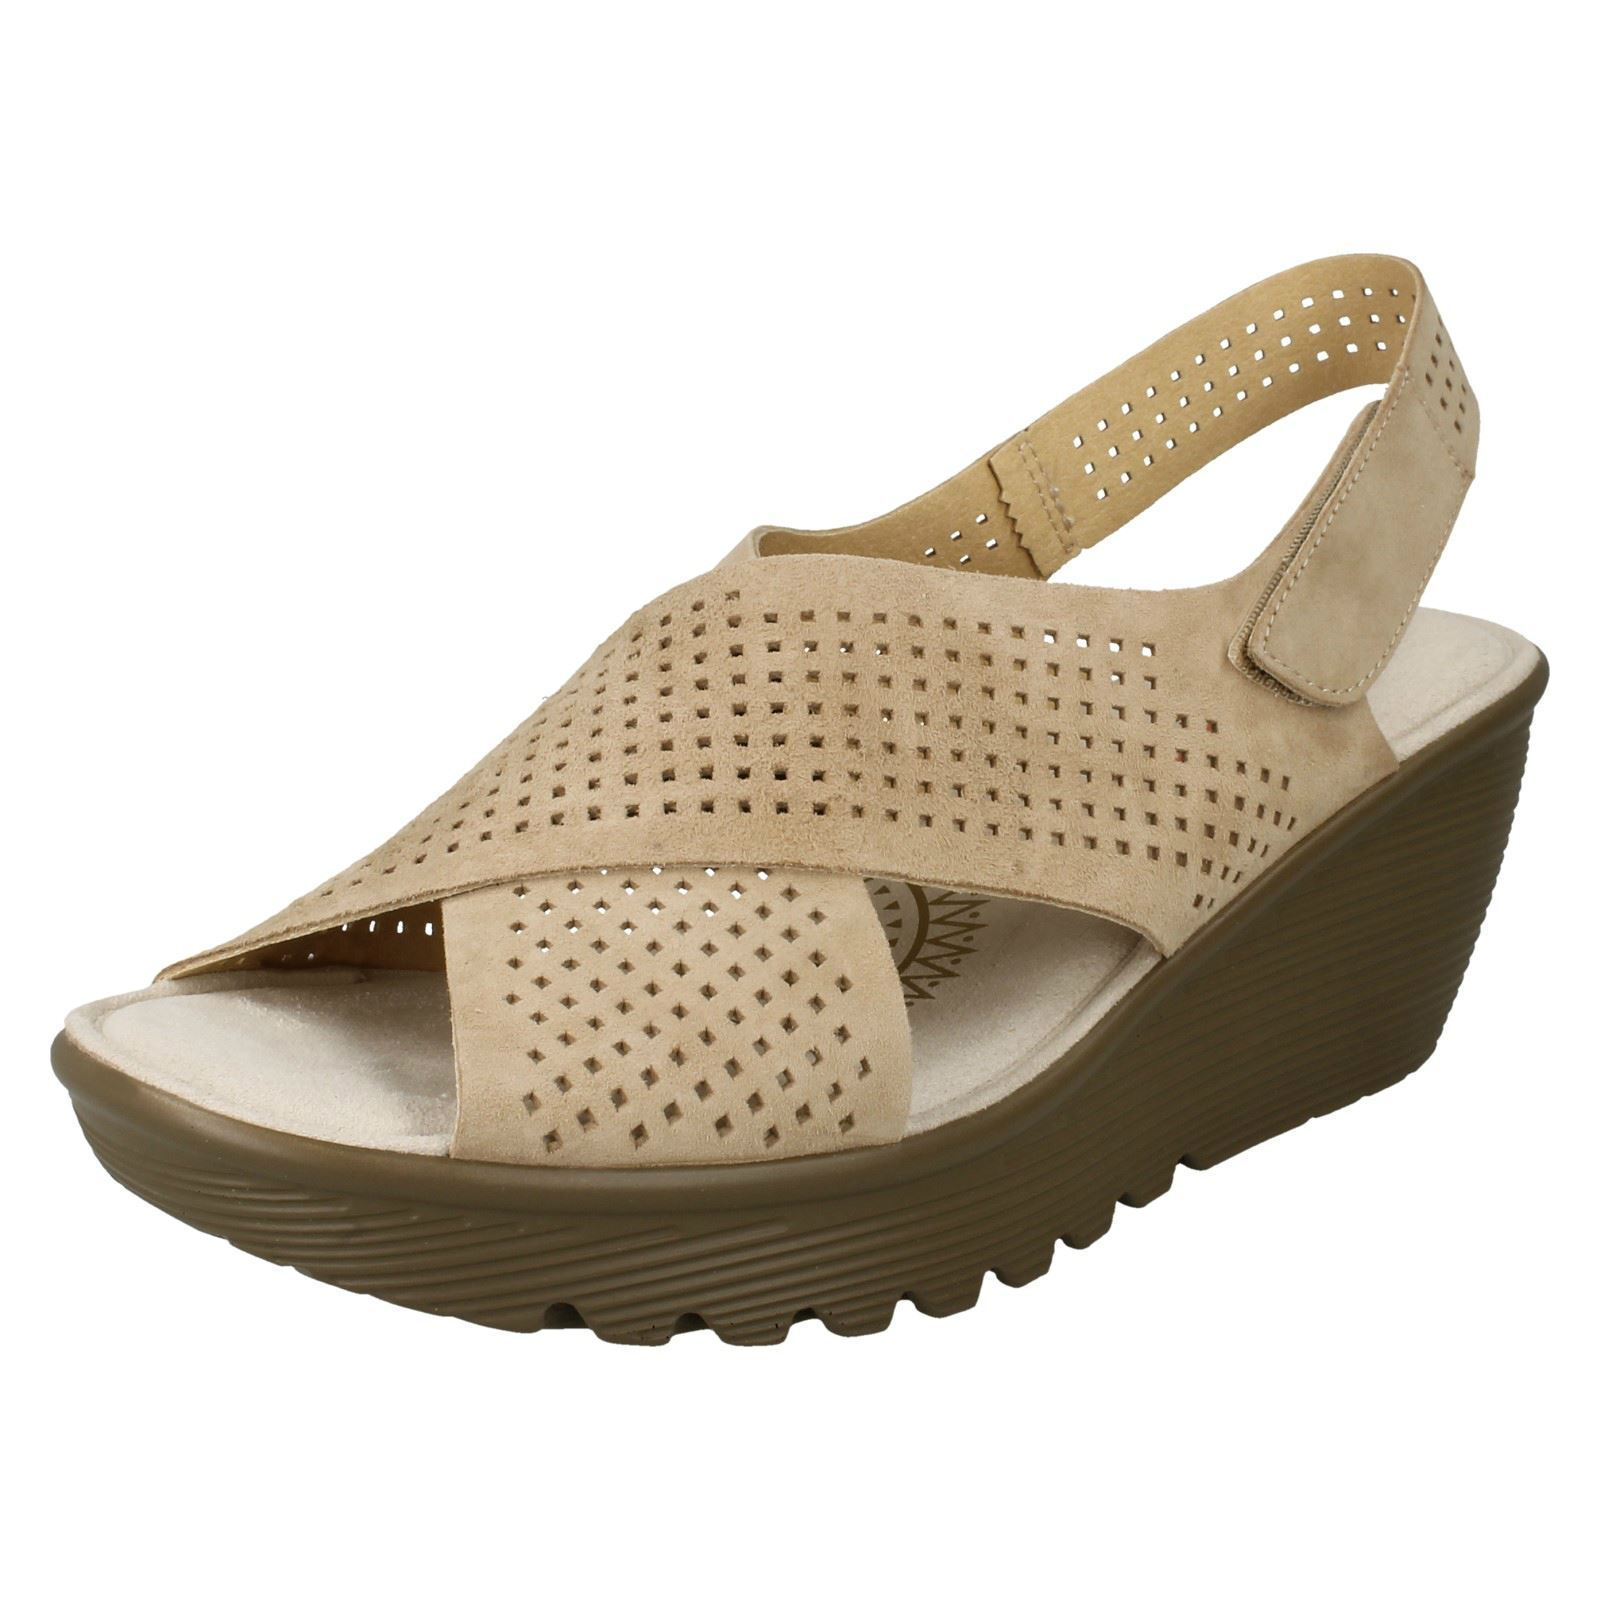 Ladies Skechers 48861 Parallel-Infrastructure Suede Leather Wedge Sandals